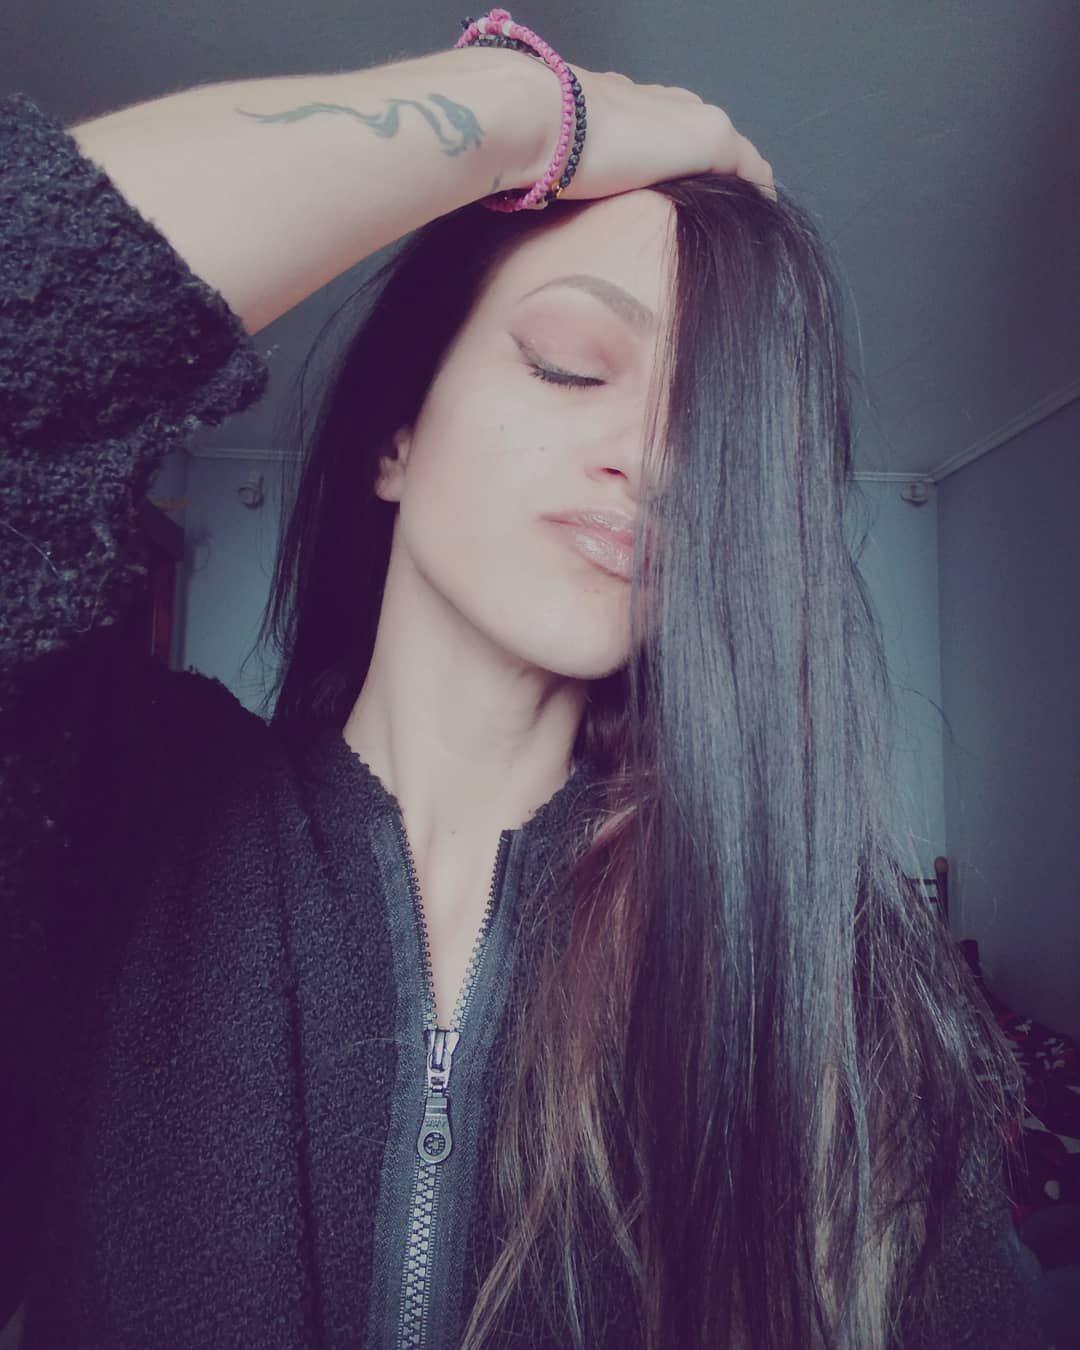 I'm done #selfie #selca #instagood #igers #igers_greece #athens #tattooed #tattooedgirls  #girlswithtattoos #inked #inkedgirls #tattooink #dragon #makeup #mascara #eyeliner #aesthetics #vsco #no #instalike #photography #selfportrait #mobilephotography